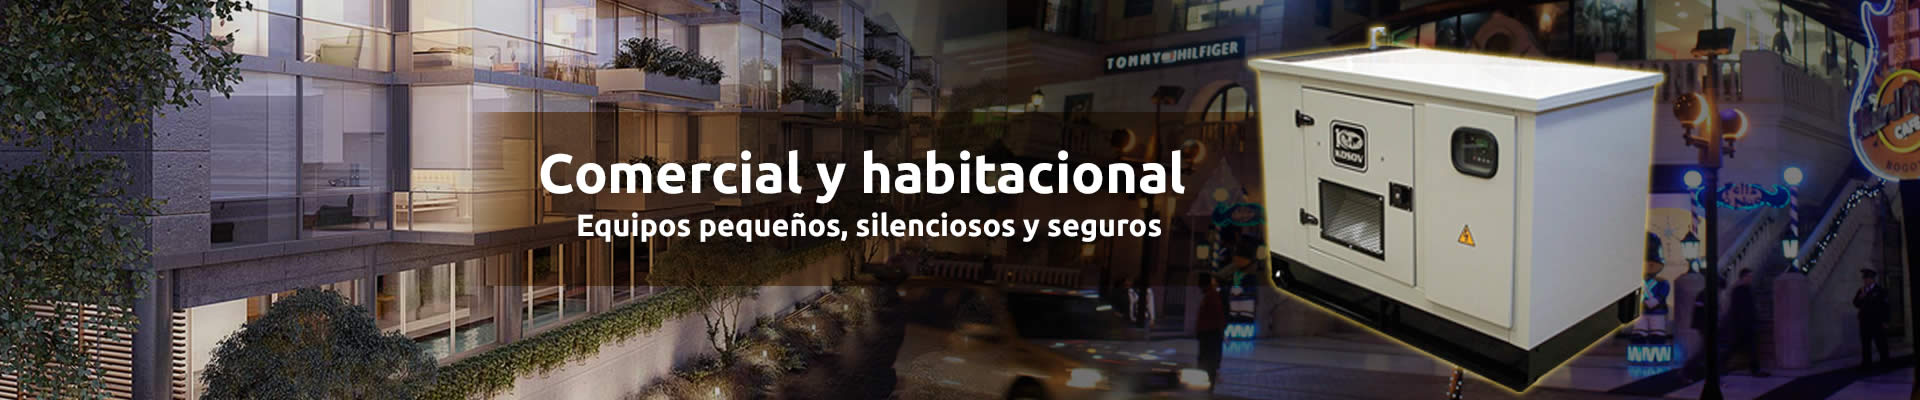 banner_comercialhabitacion